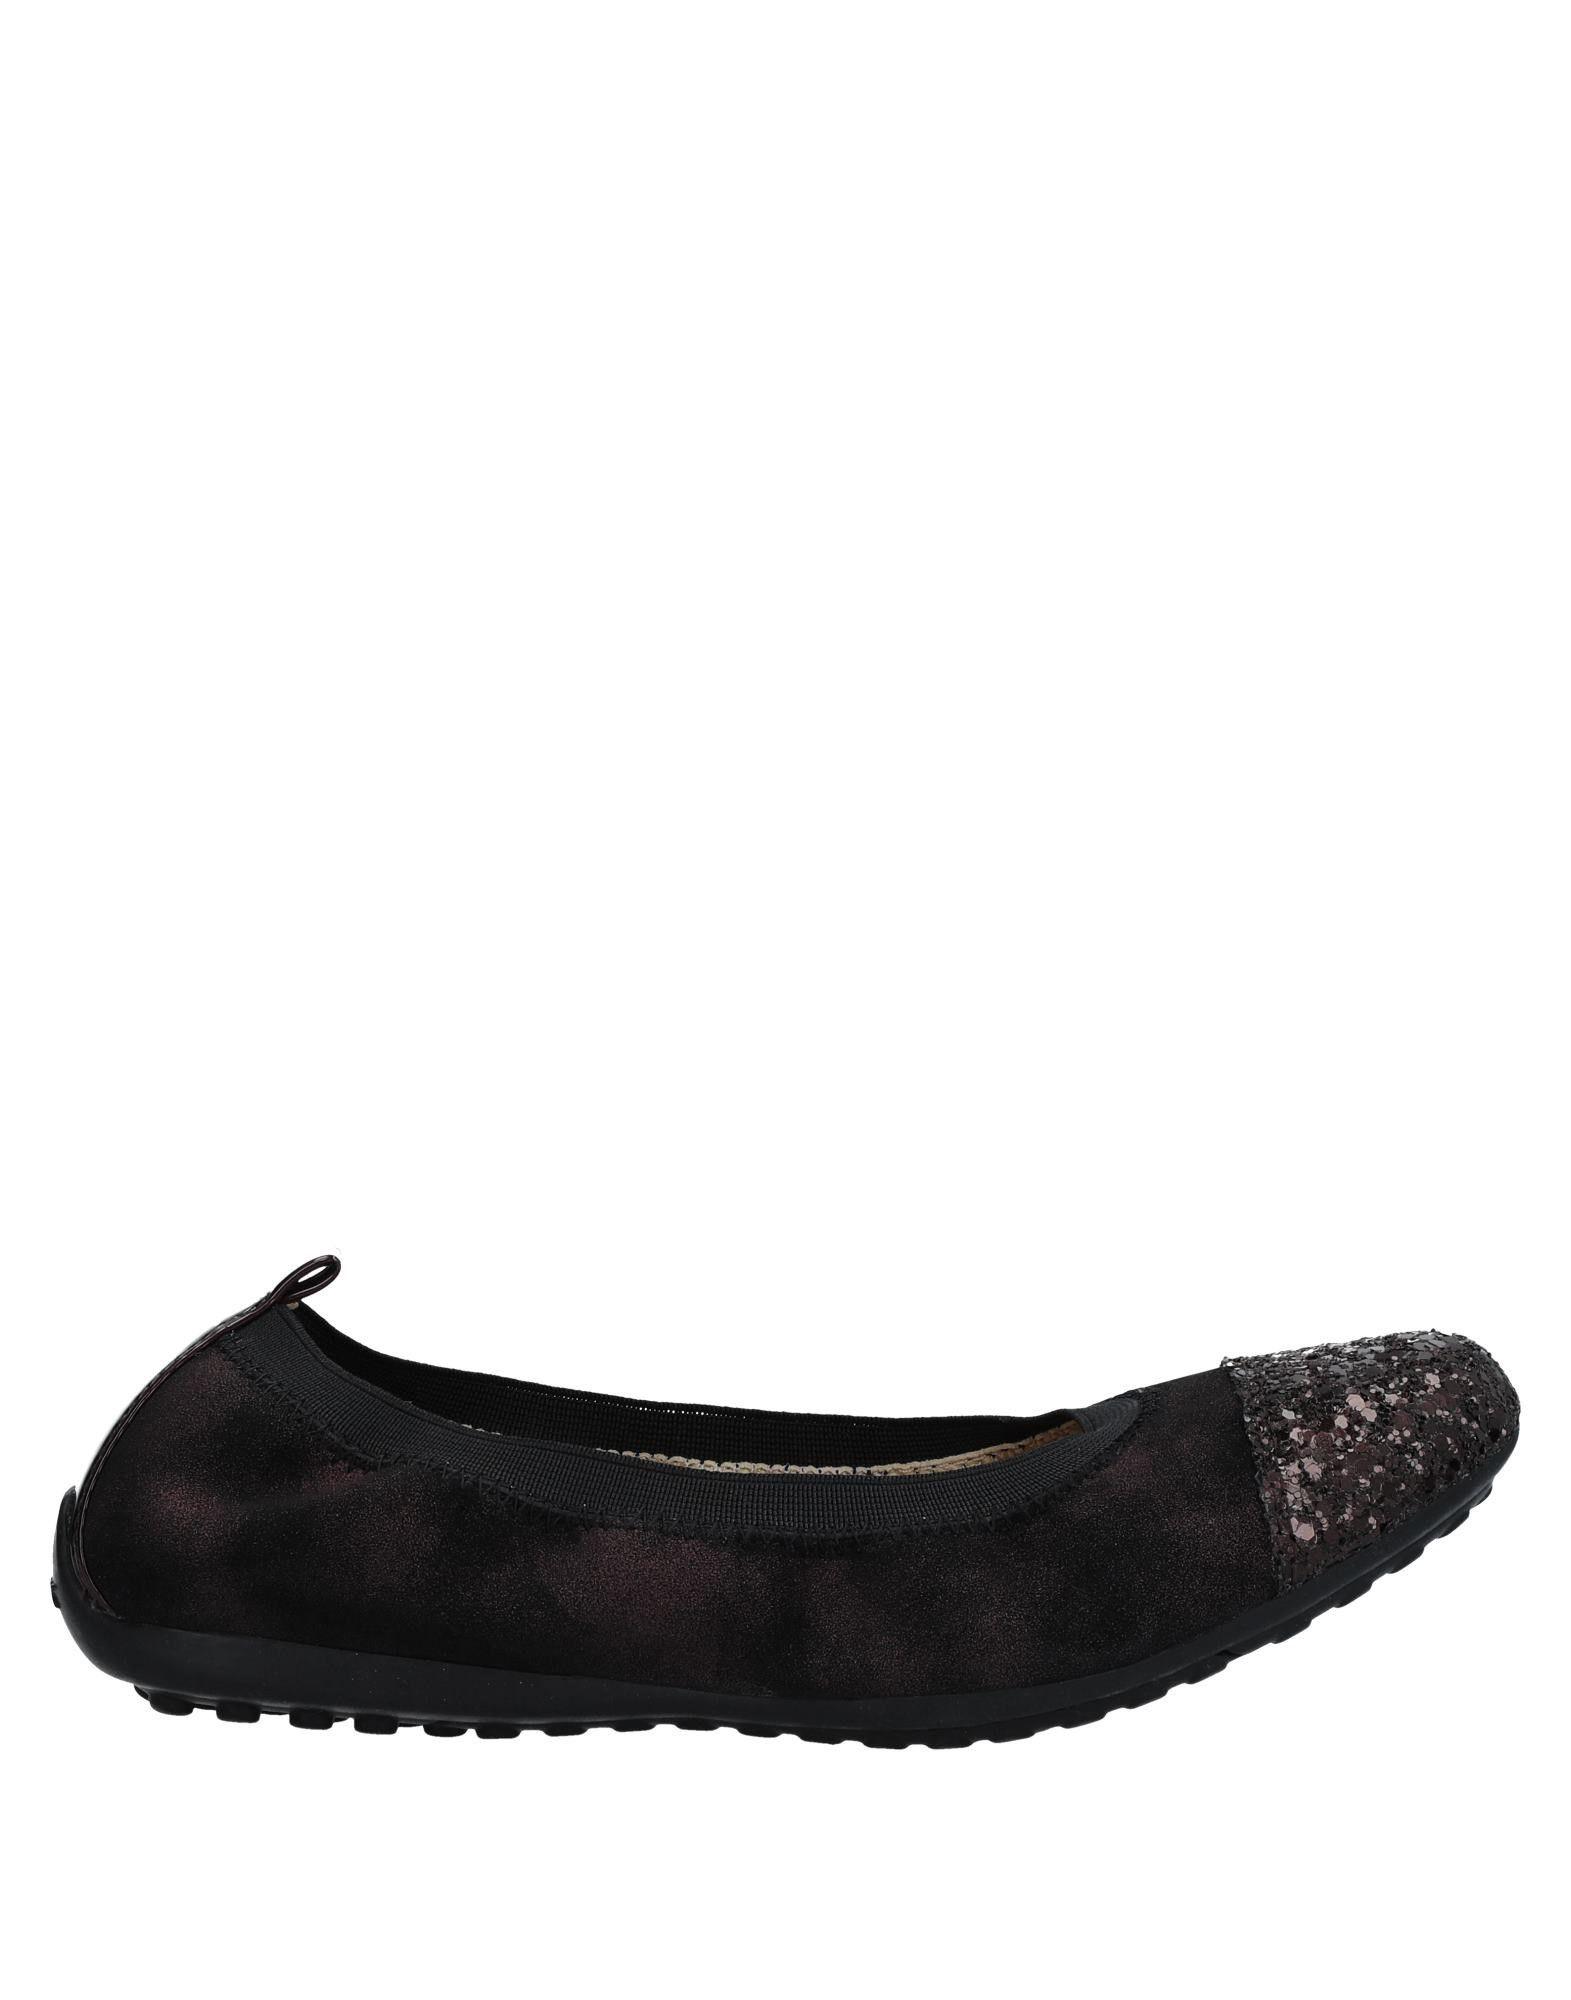 Geox 11540641SK Ballerinas Damen  11540641SK Geox Gute Qualität beliebte Schuhe a1f803